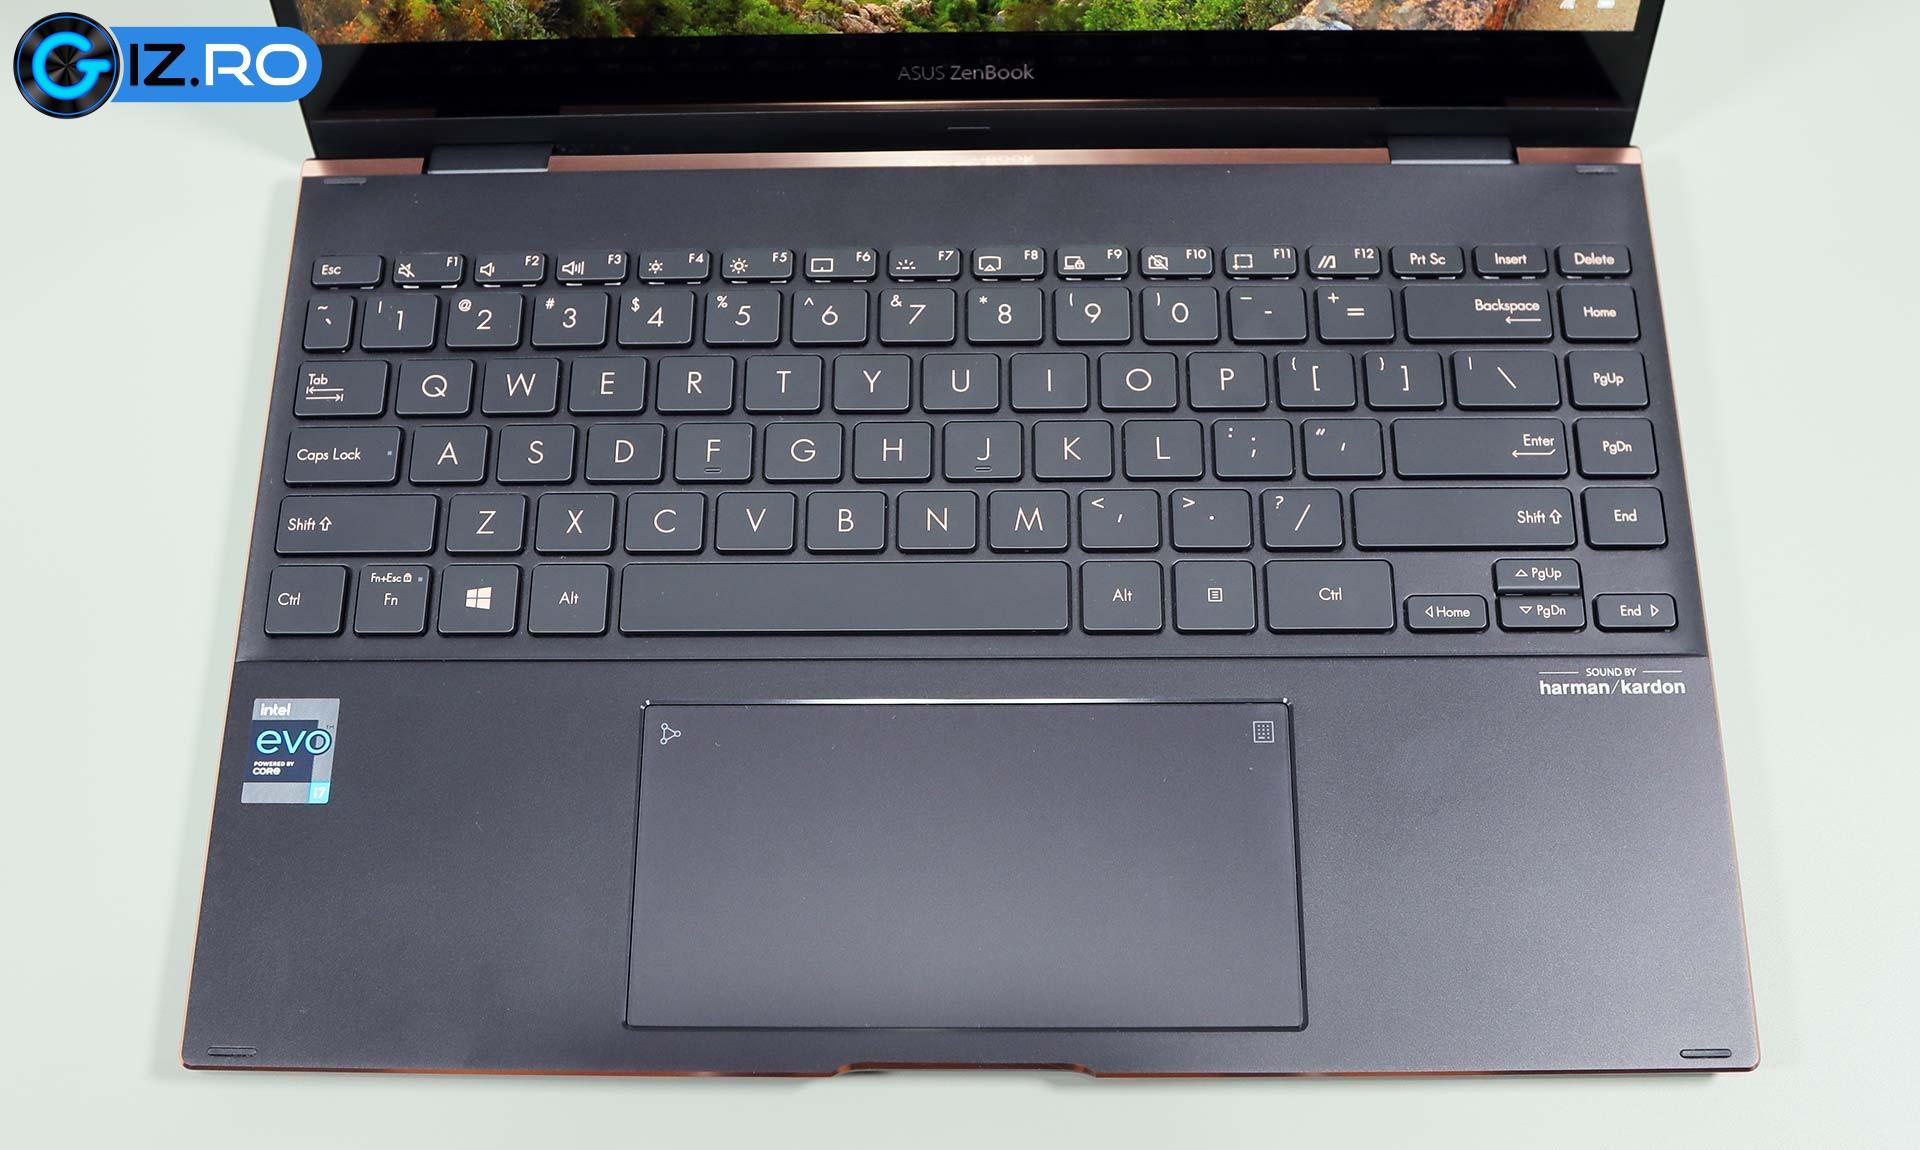 asus-zenbook-ux371-keybpoard-layout